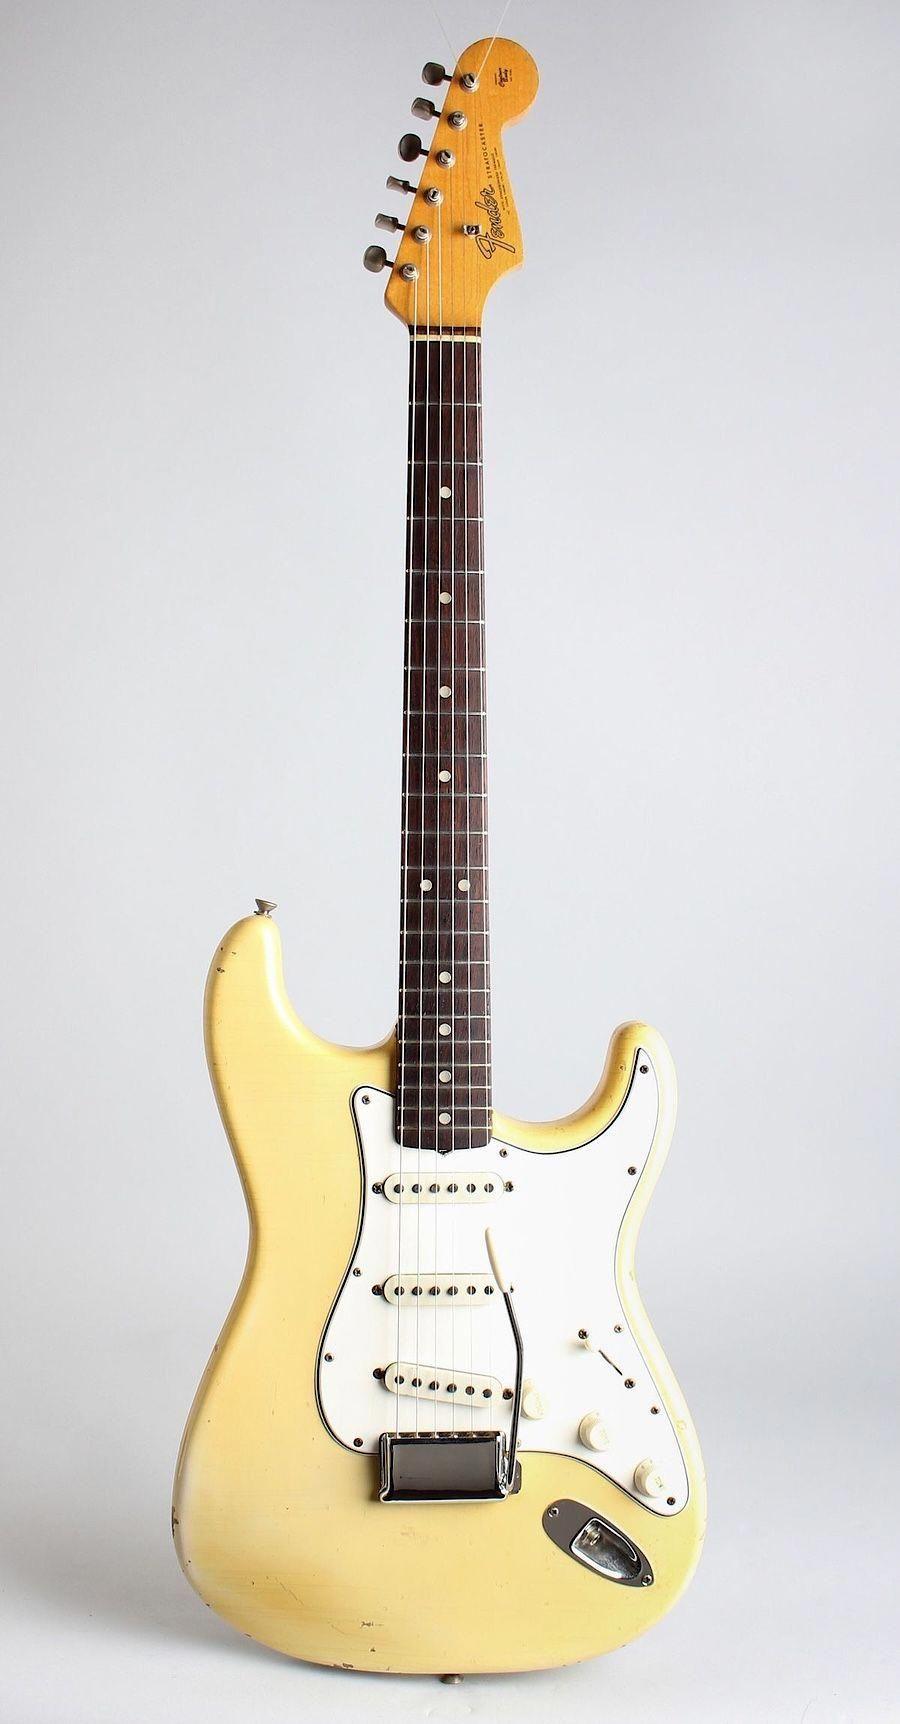 Travel Guitar Yamaha Travel Guitar Left Hand Guitarsdaily Guitarcenter Travelguitar Guitarras Fender Guitarra Electrica Fender Guitarras